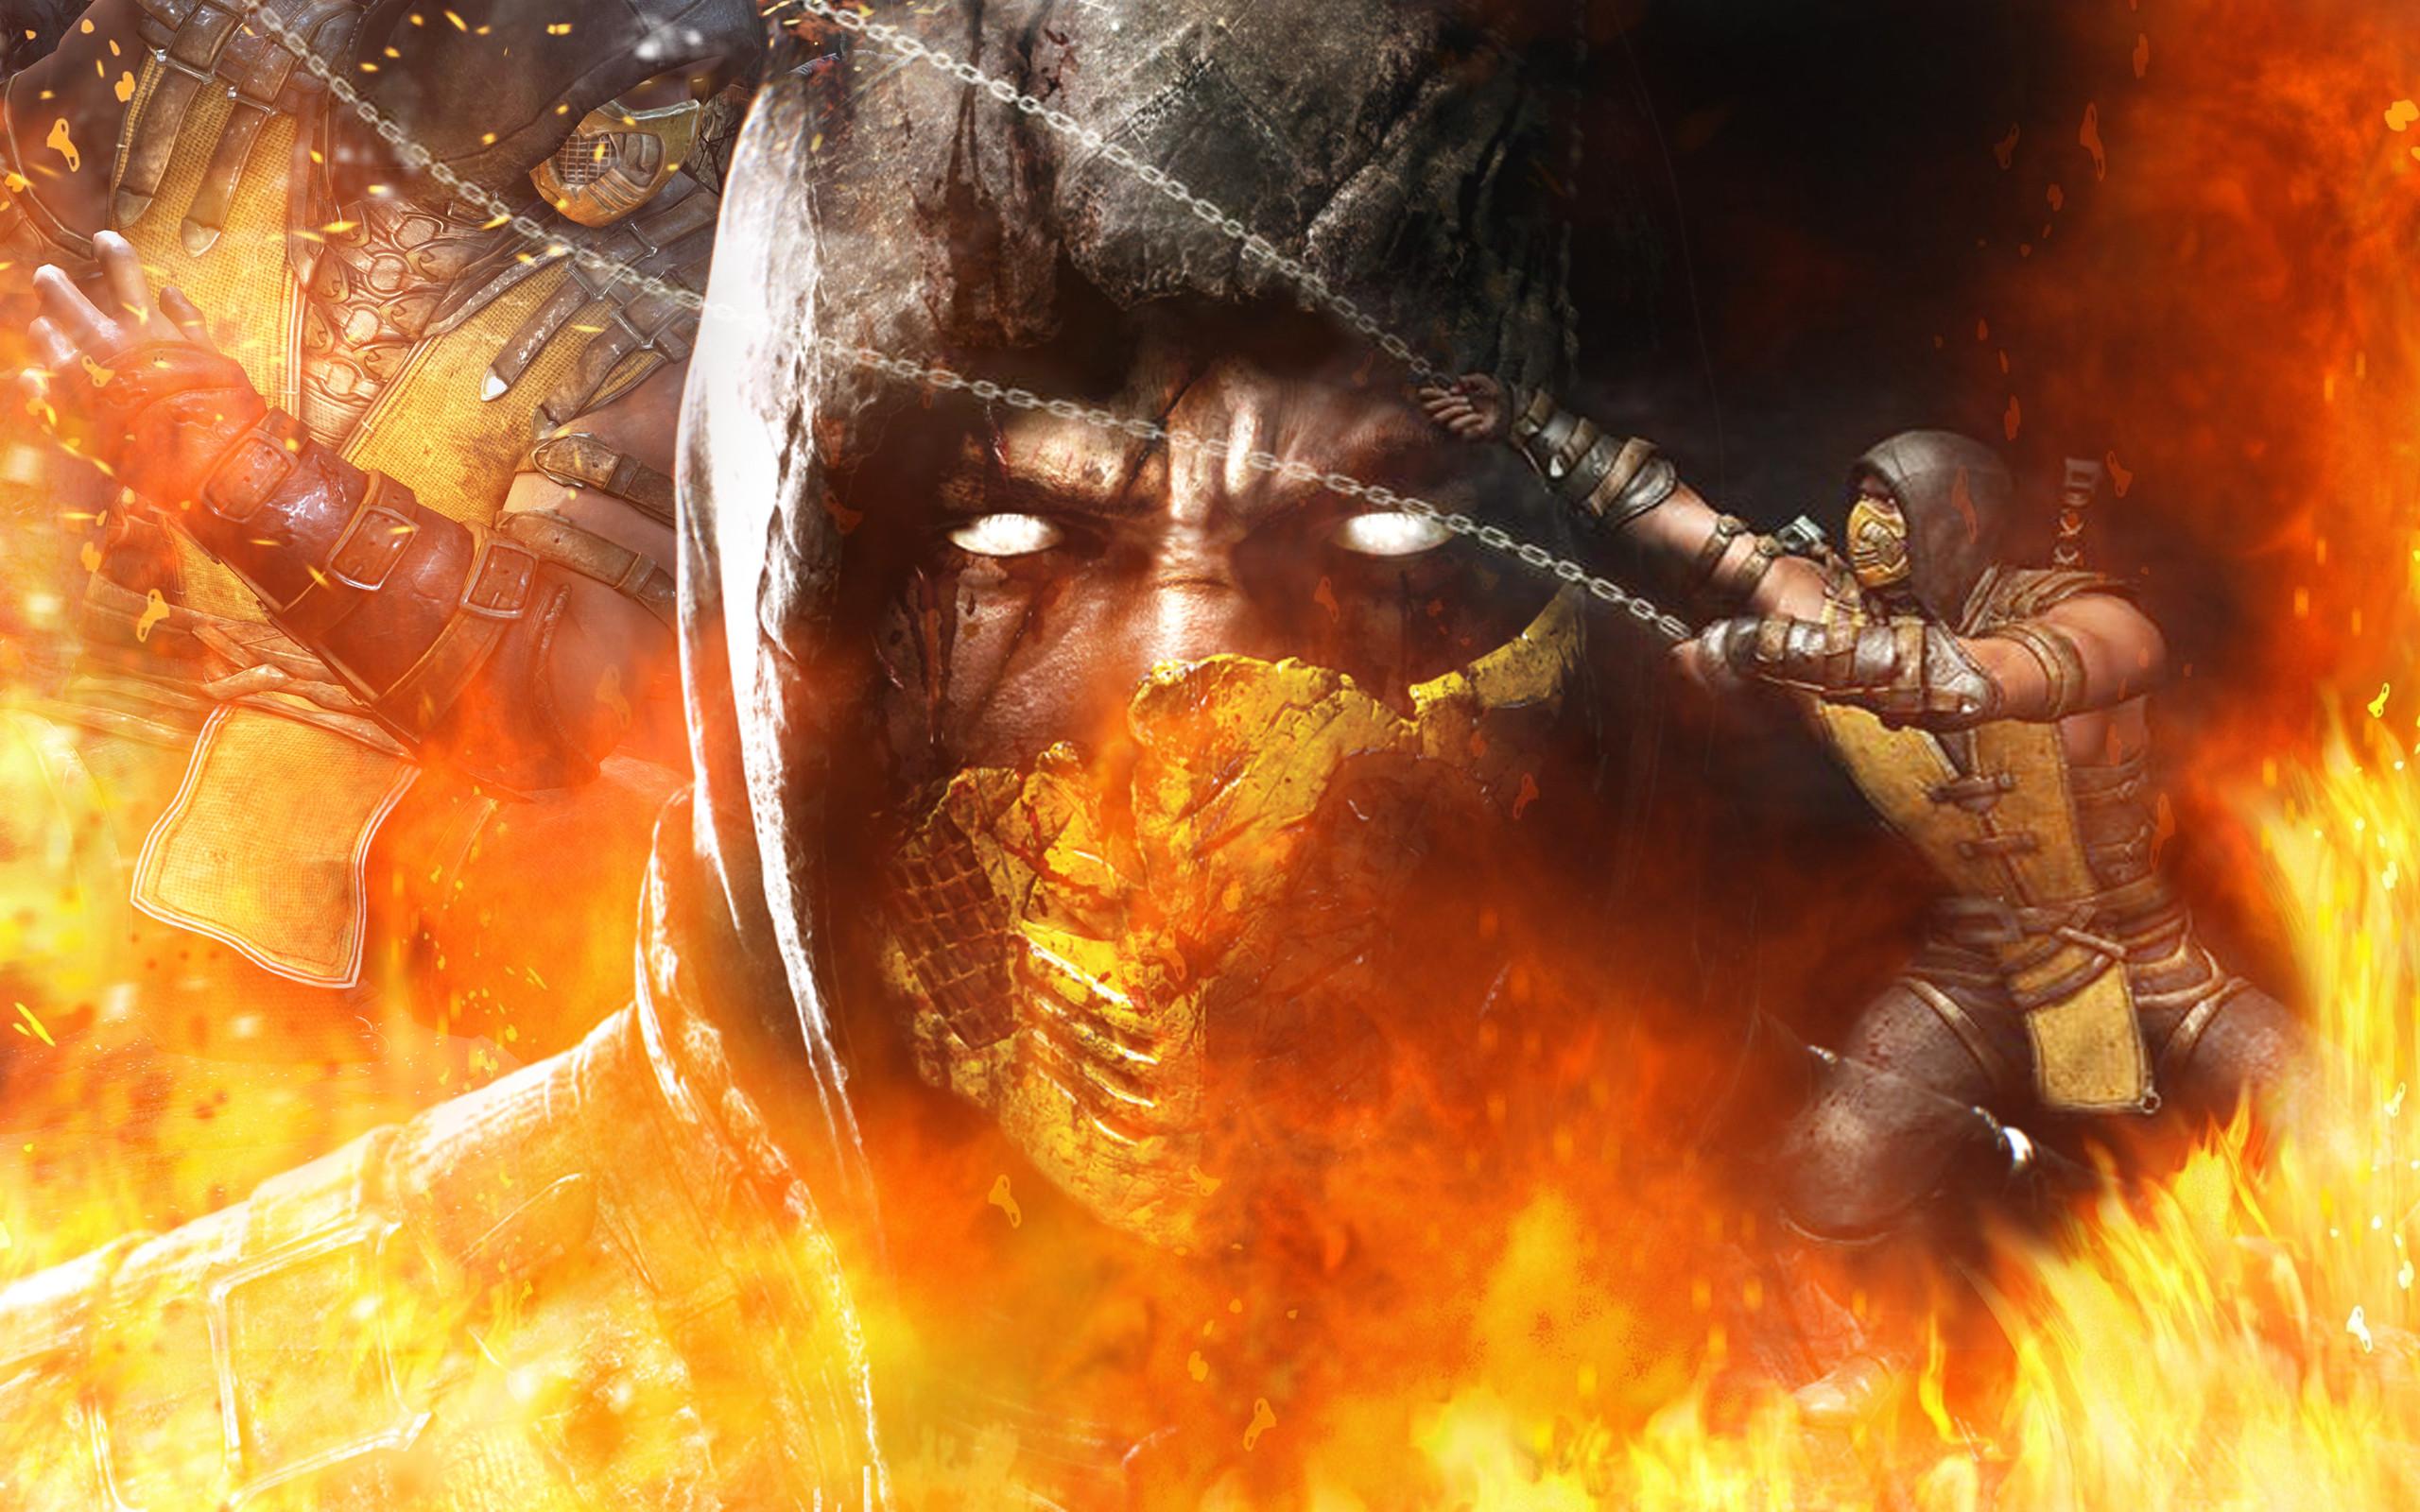 … Mortal Kombat X – Scorpion by barrymk100